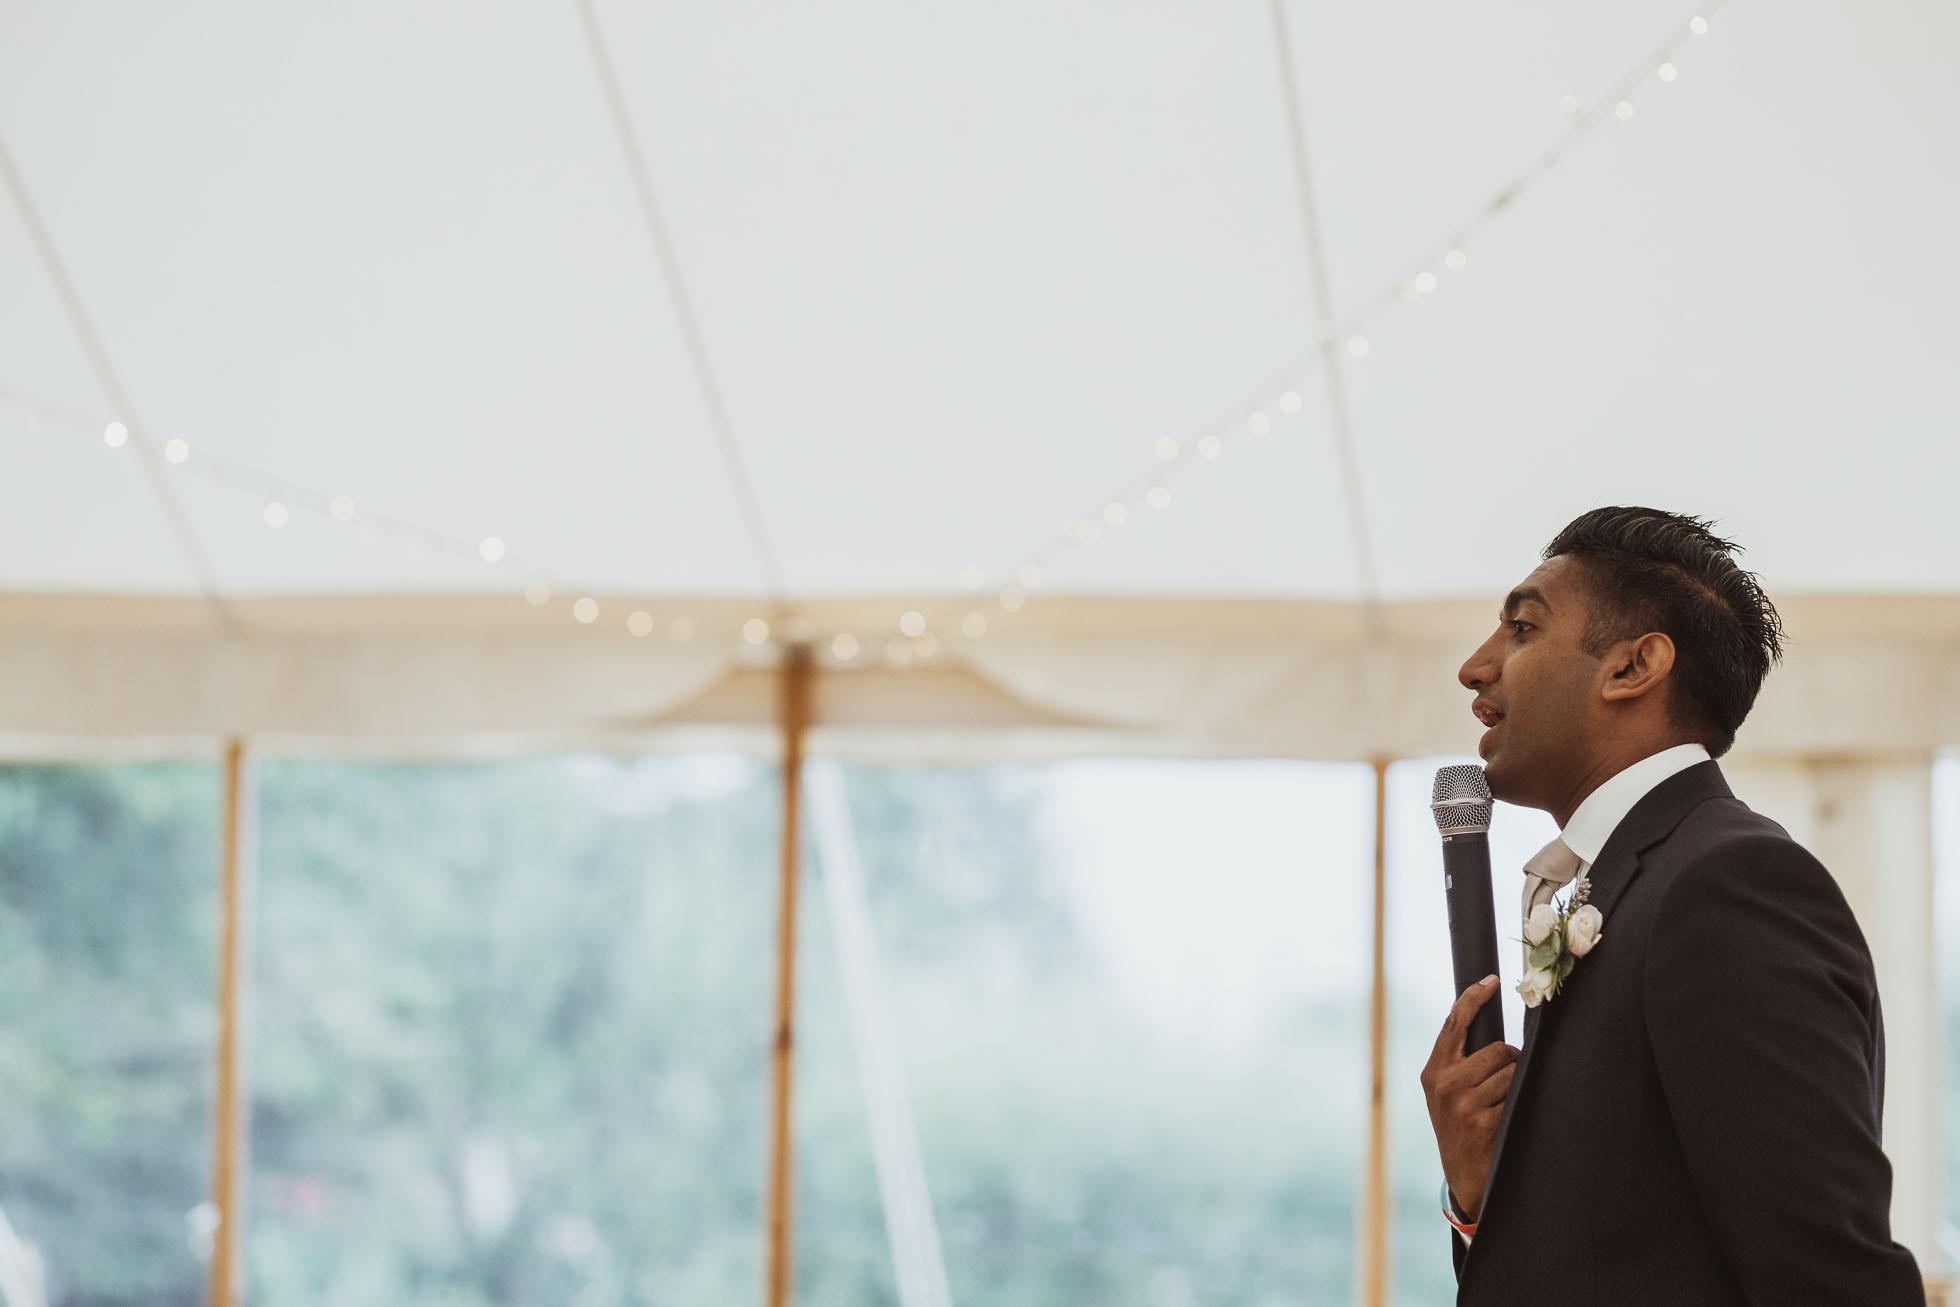 norton_conyers_wedding_photographer-71.jpg